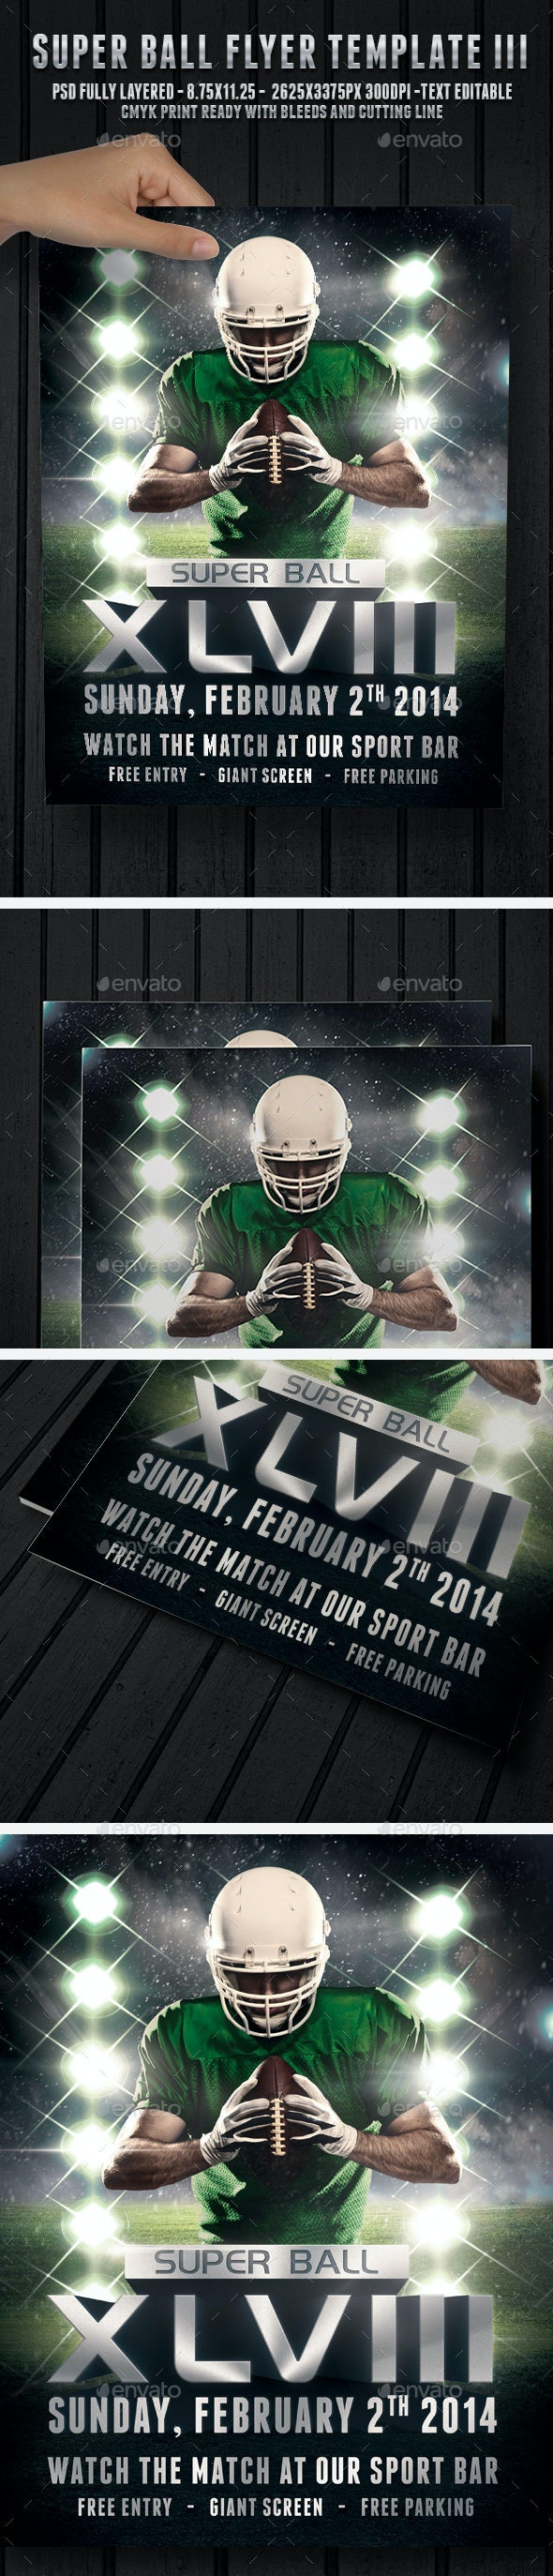 Super Ball Football 3 - Flyer Template - Sports Events